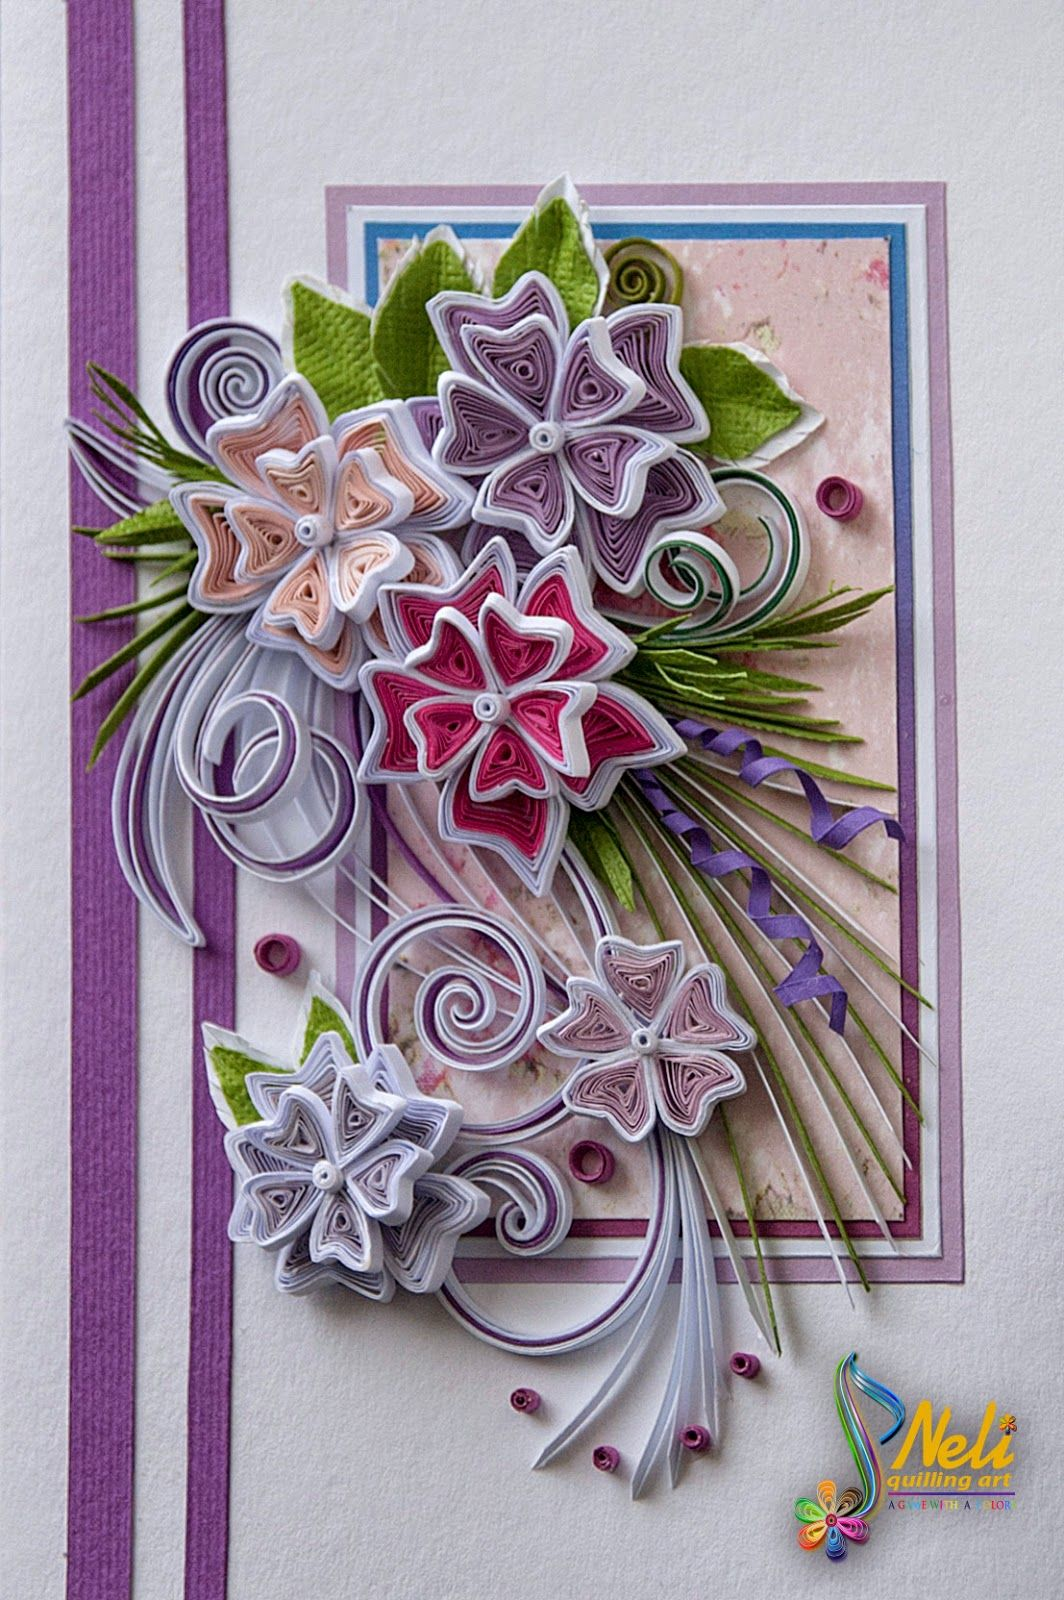 Neli quilling art quilling card 14 8 cm 10 5 cm for Quilling designs